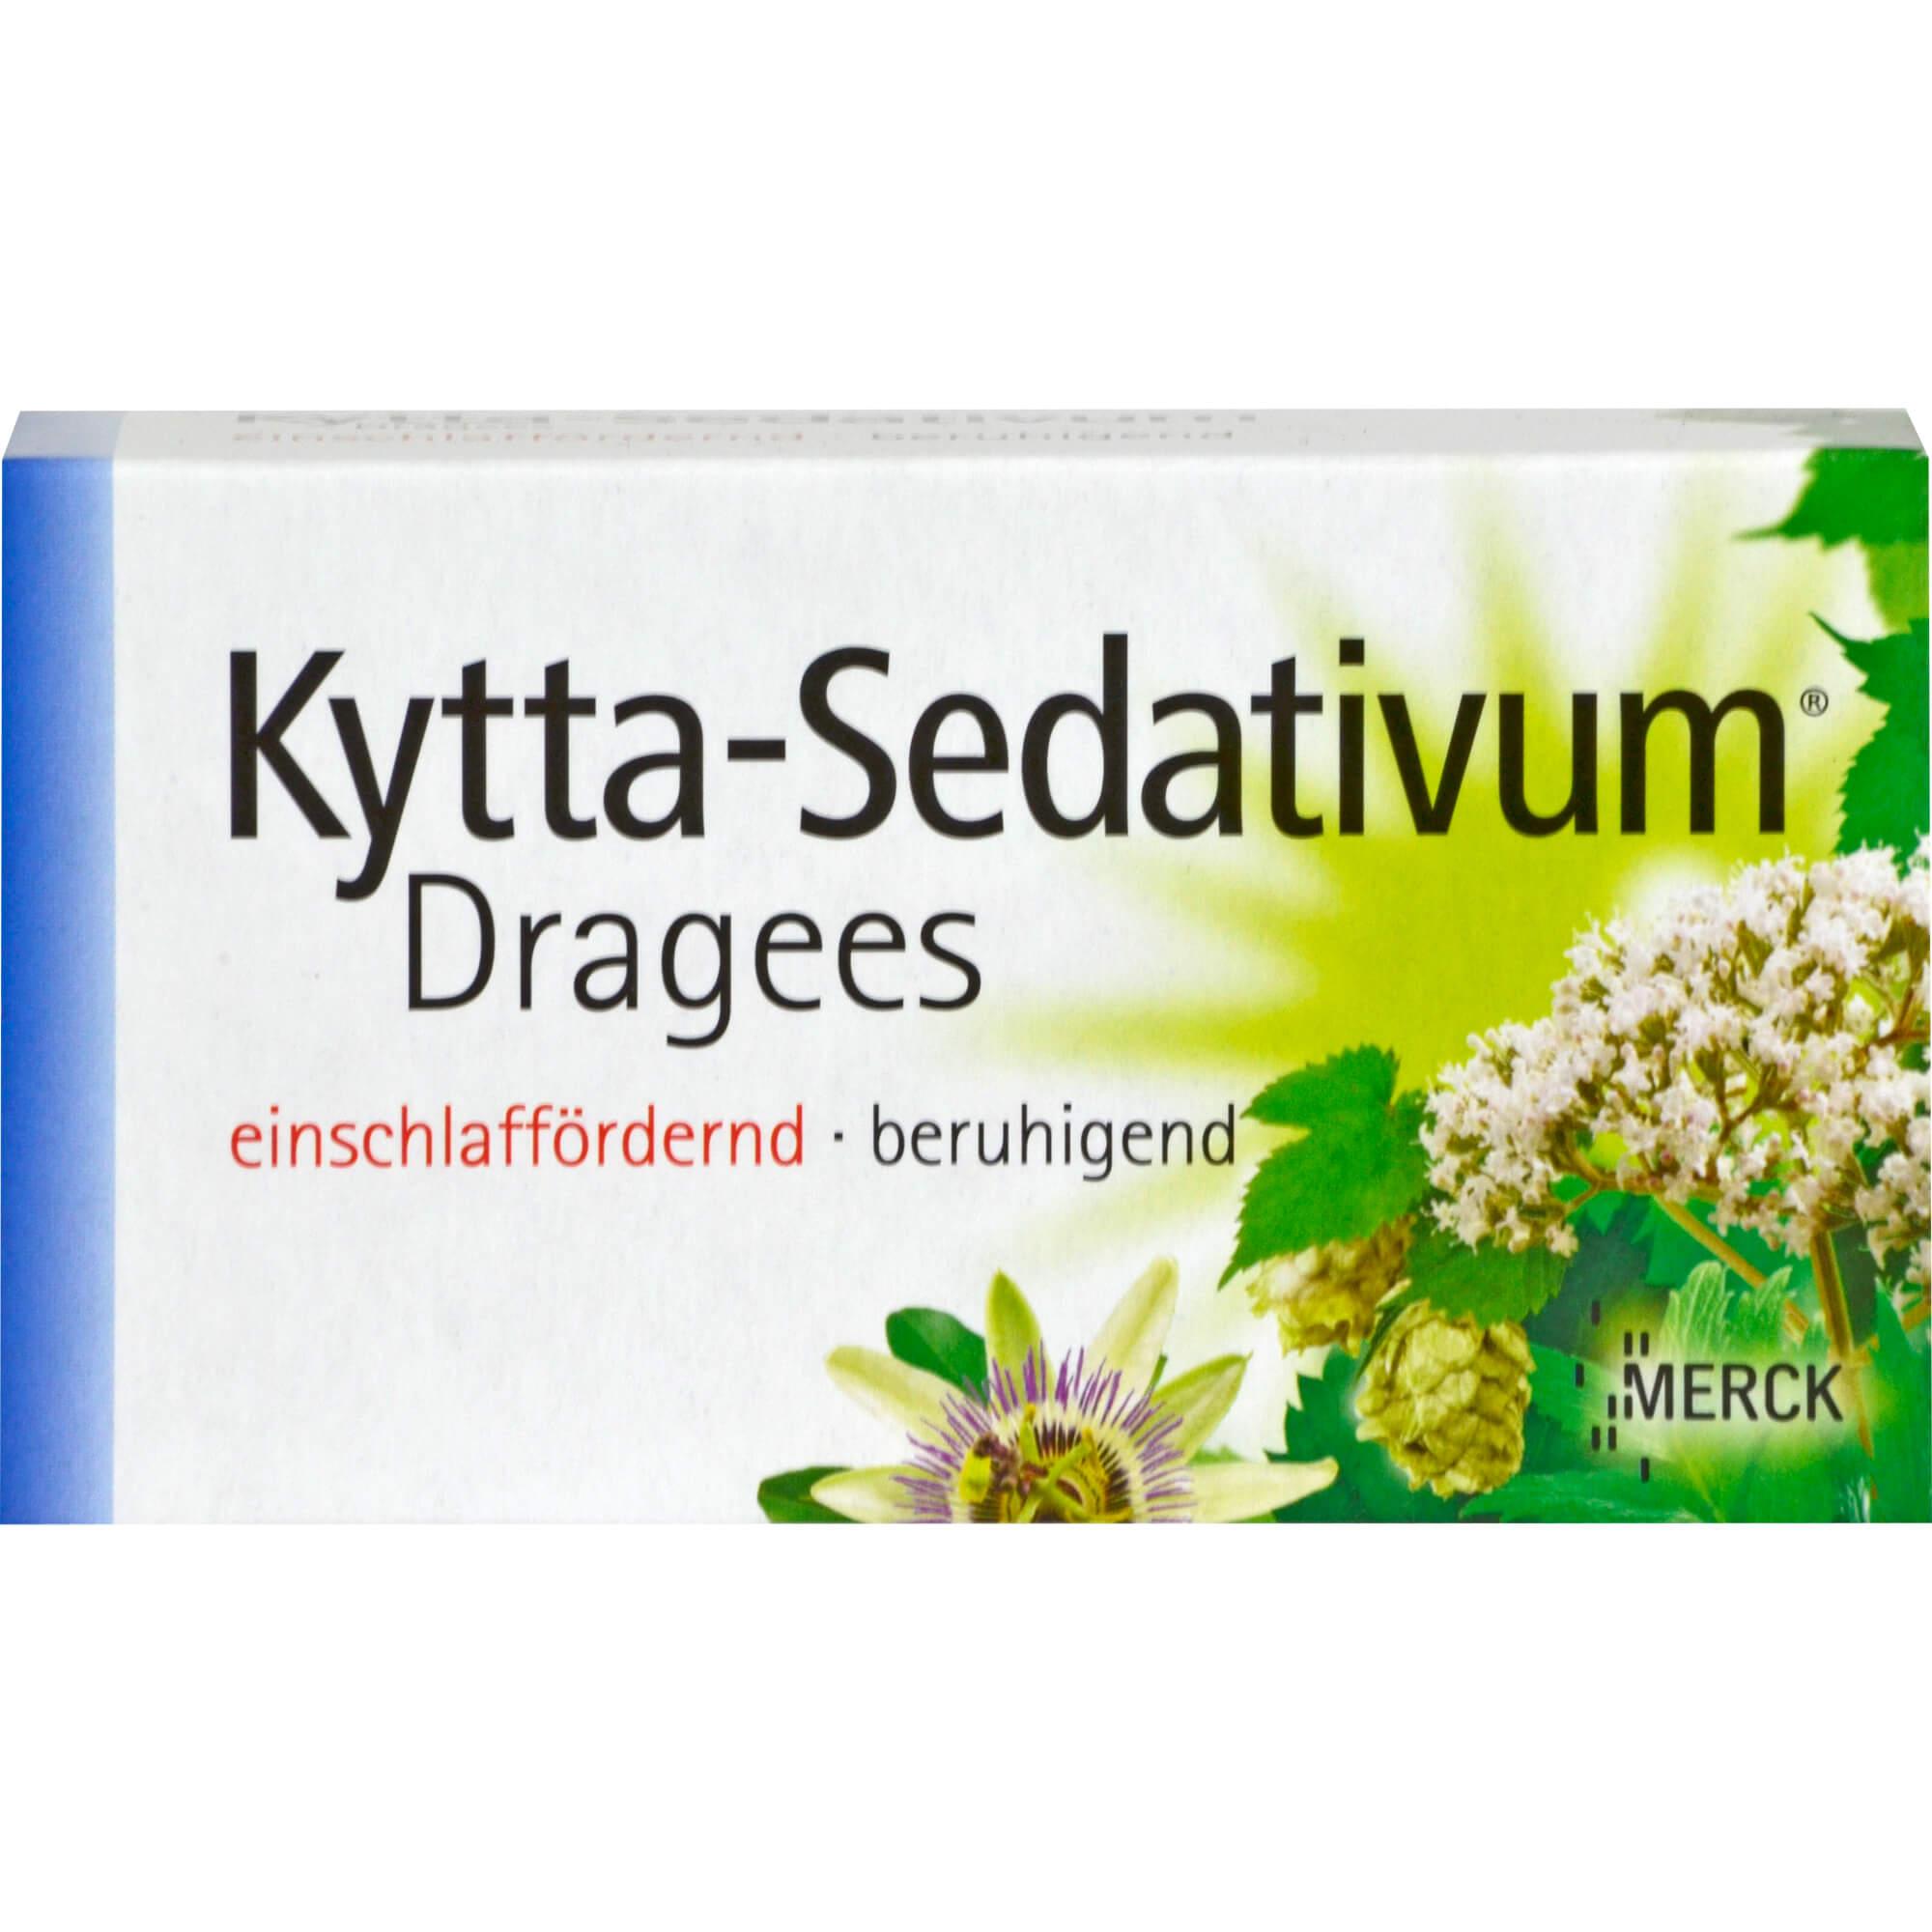 KYTTA SEDATIVUM Dragees